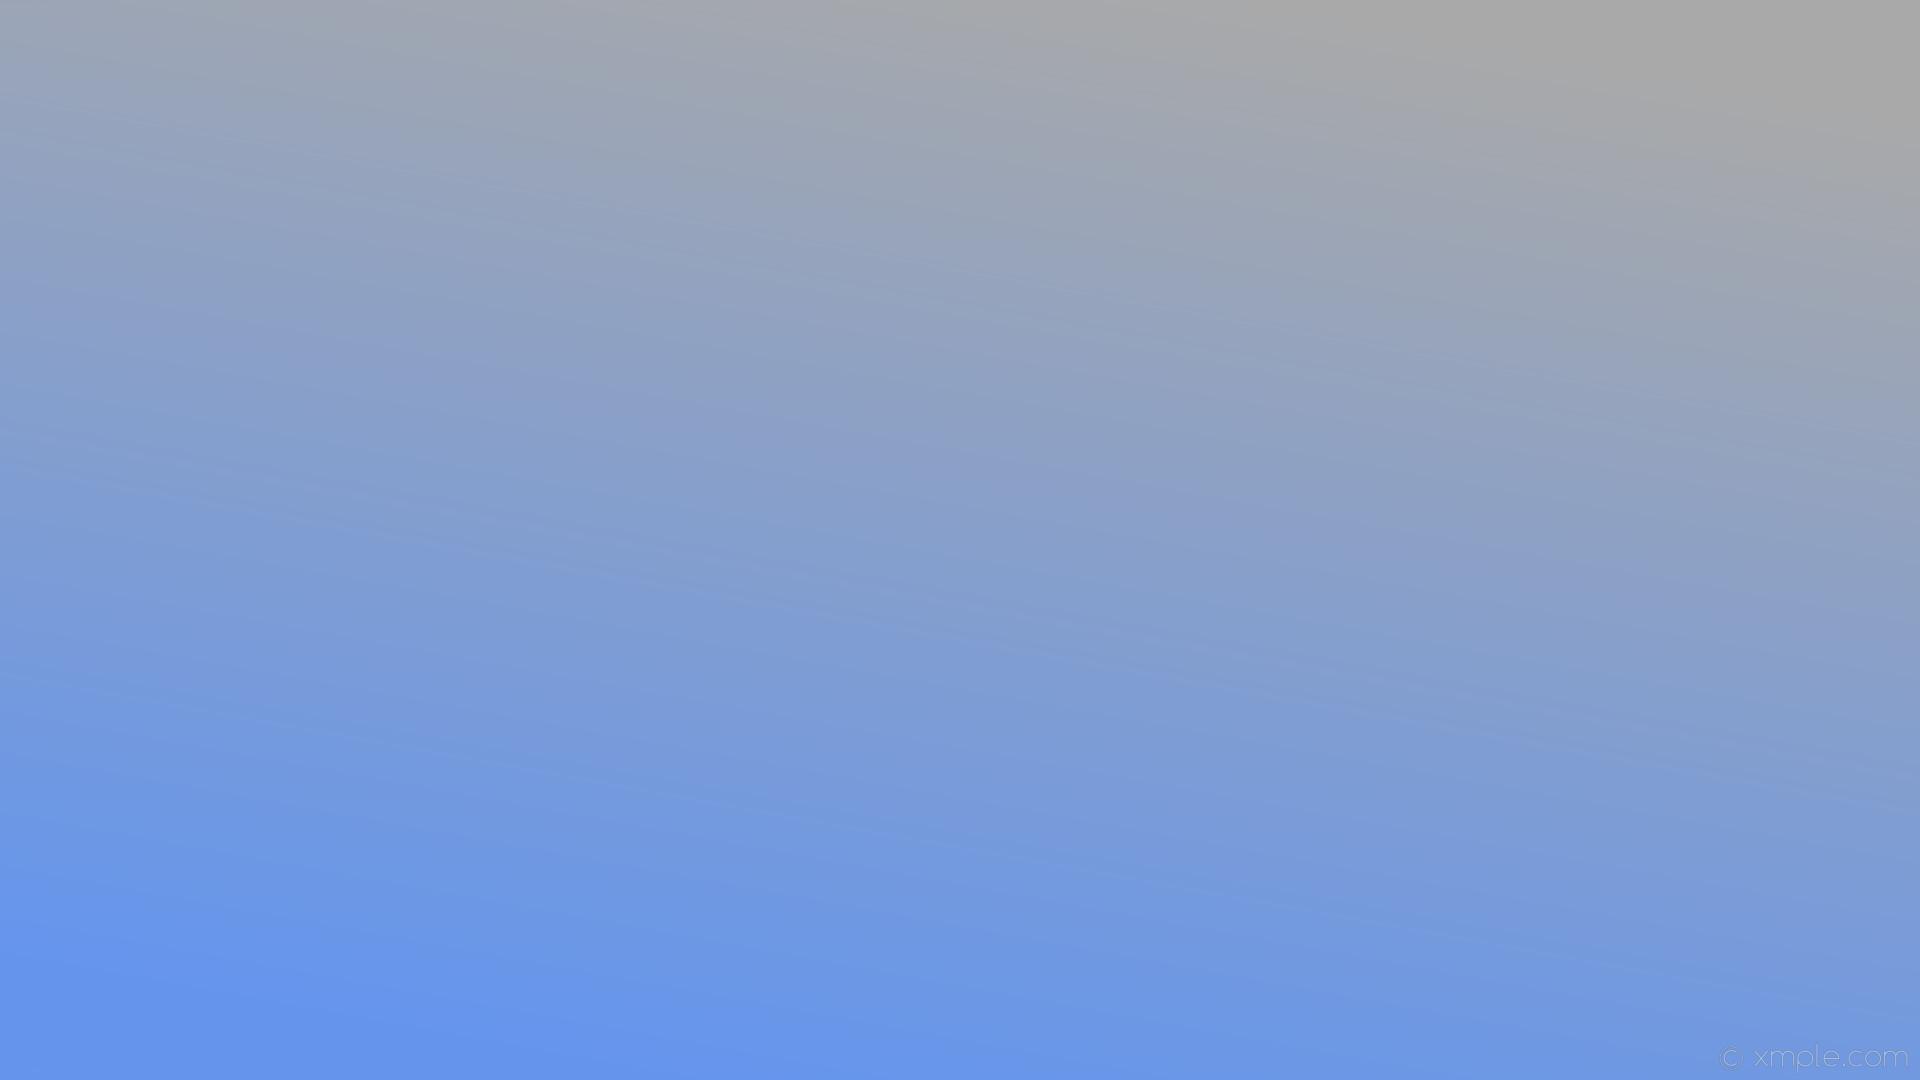 wallpaper linear grey blue gradient cornflower blue dark gray #6495ed  #a9a9a9 240°